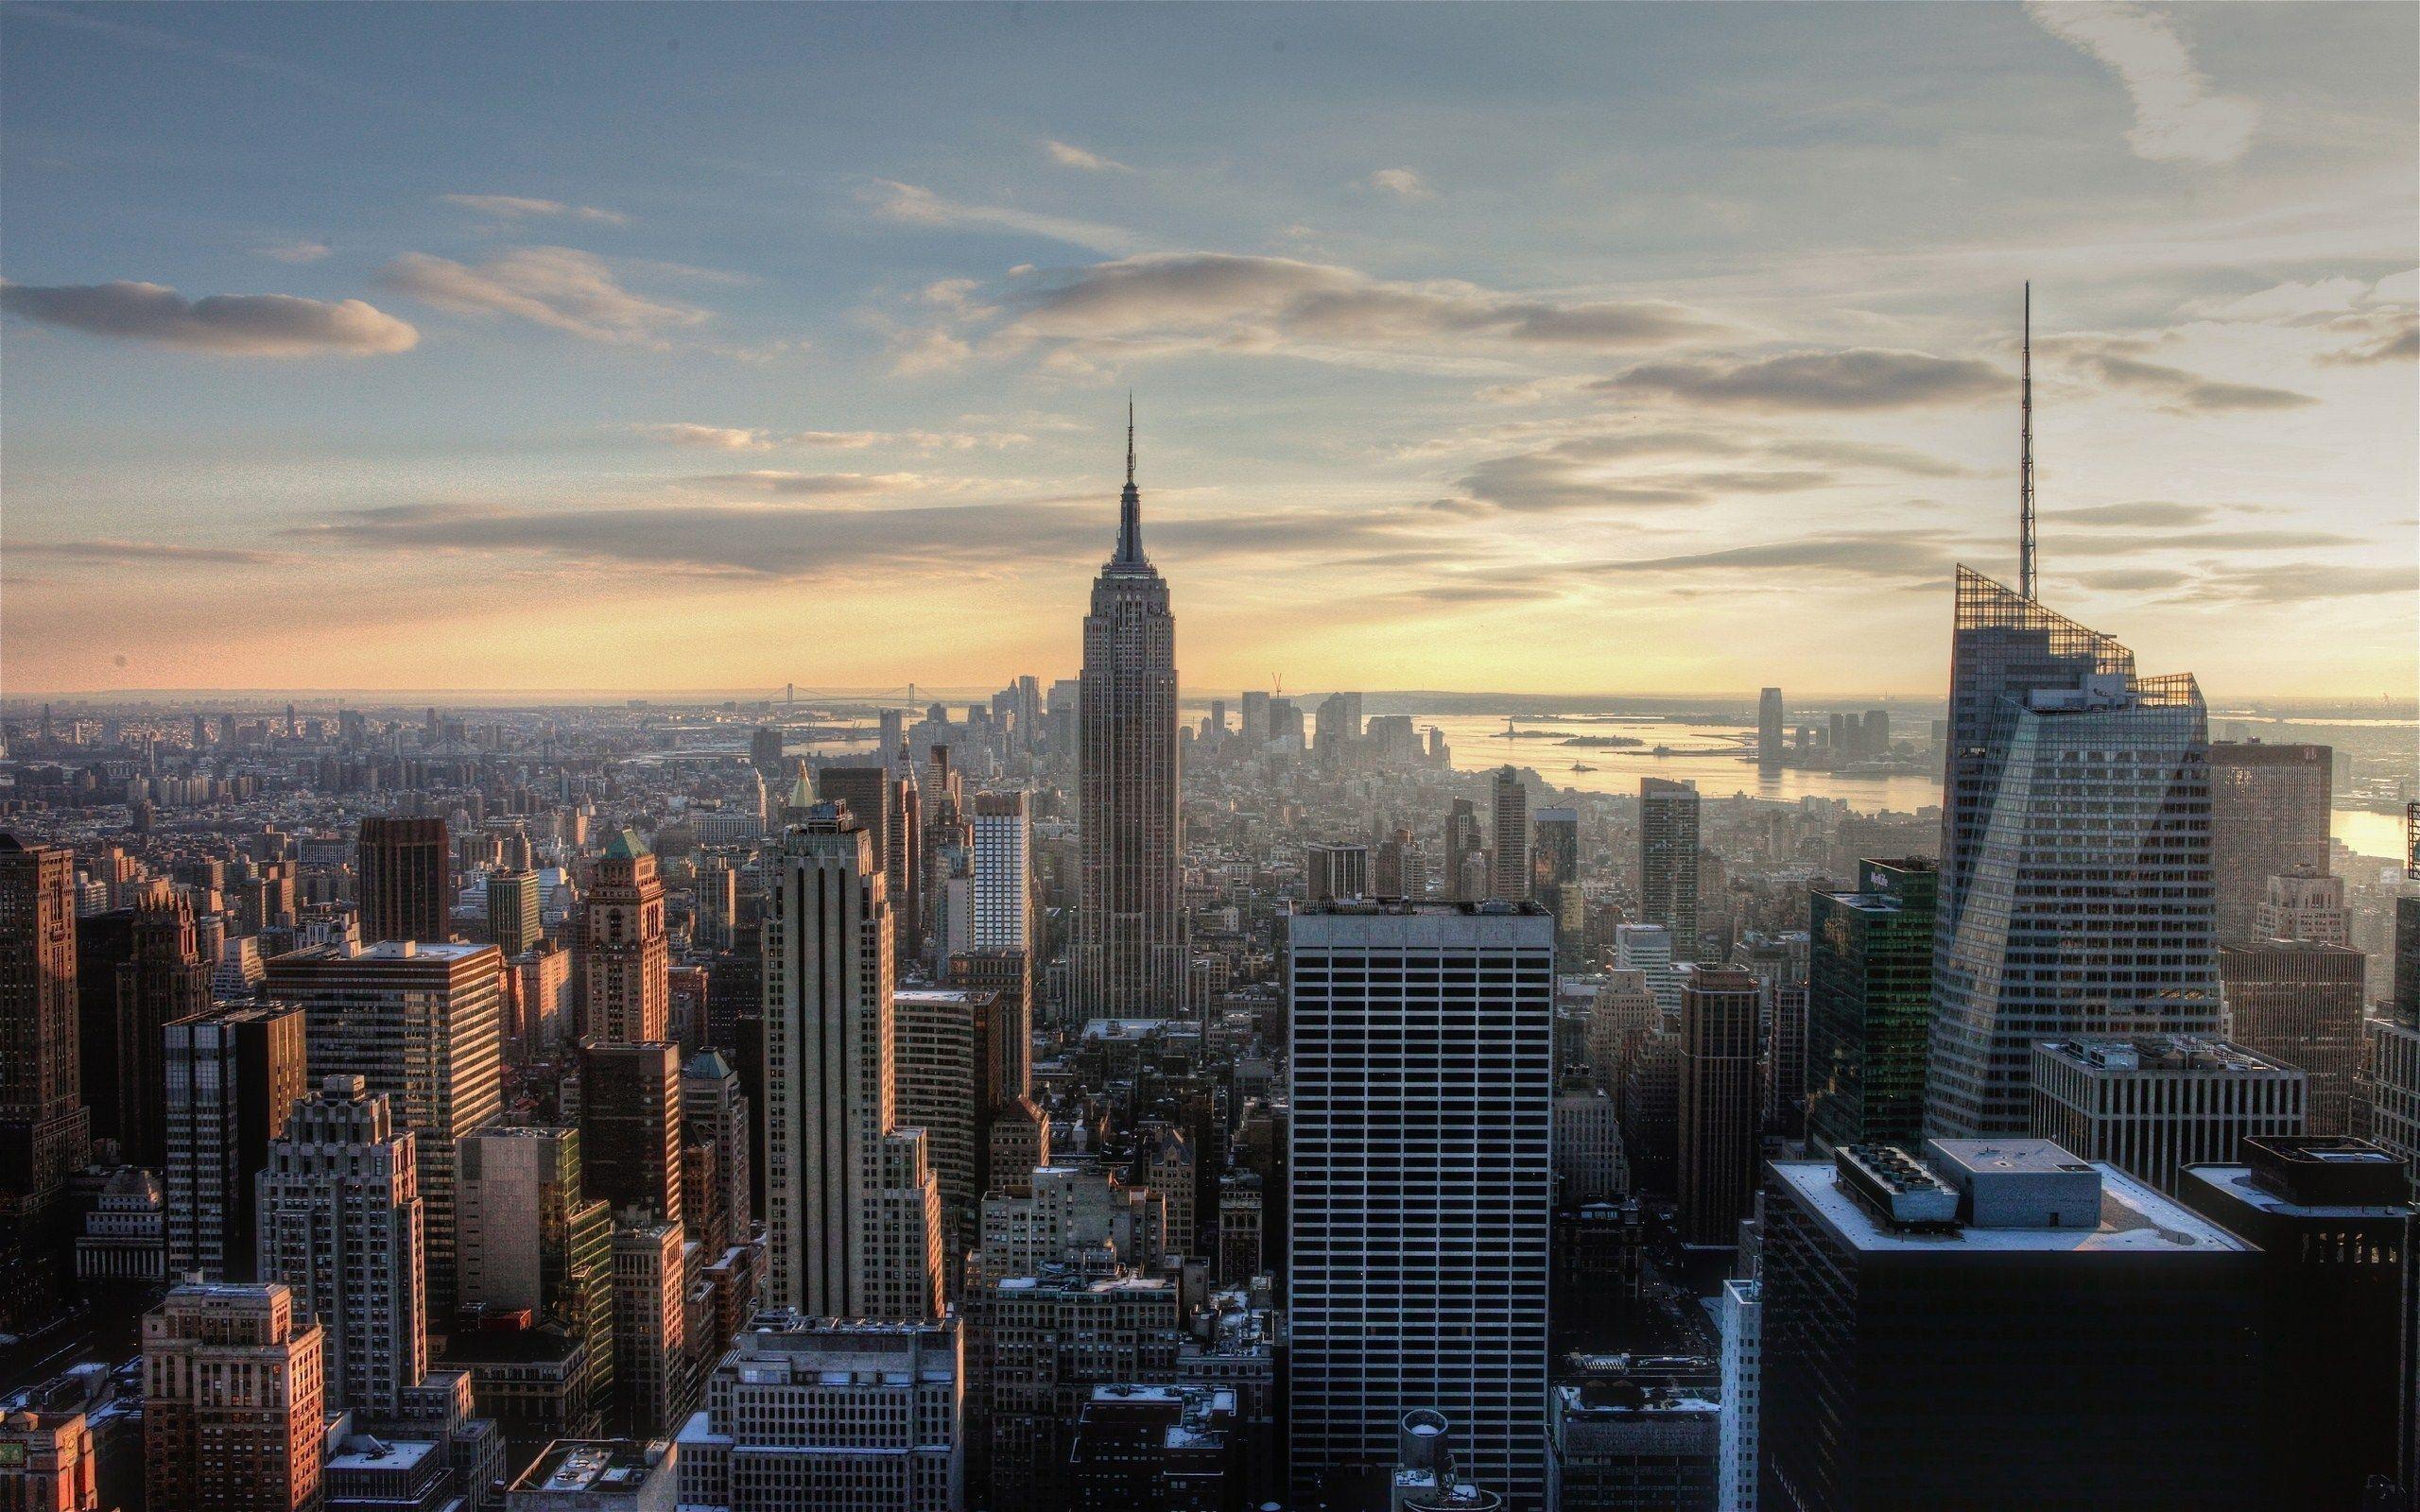 New York City Desktop Wallpaper 2560ã—1600 High Definition - New York City - HD Wallpaper